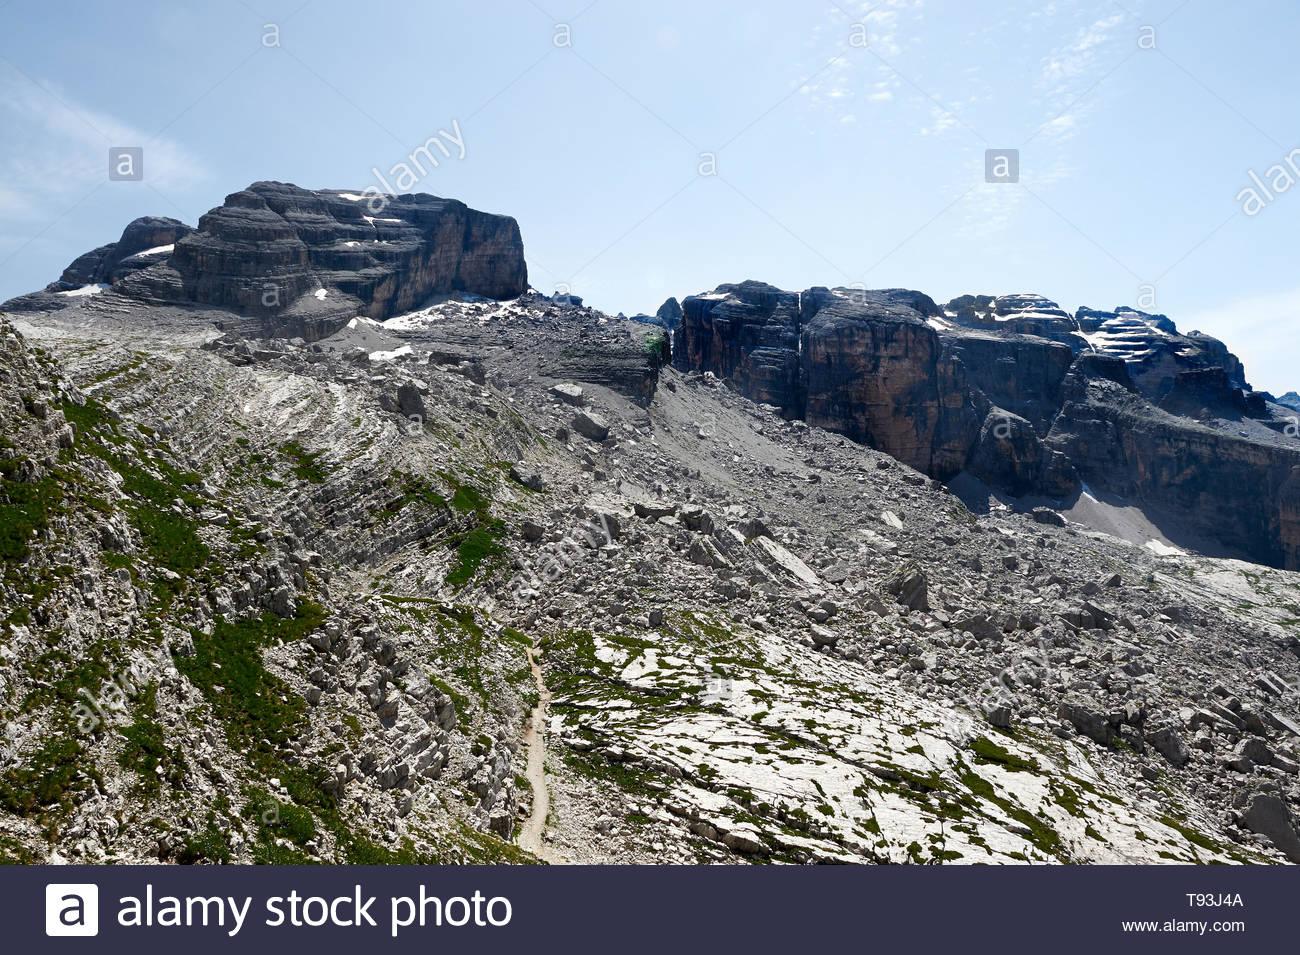 tuckett refuge, grostè trail, dolomiti di brenta - Stock Image